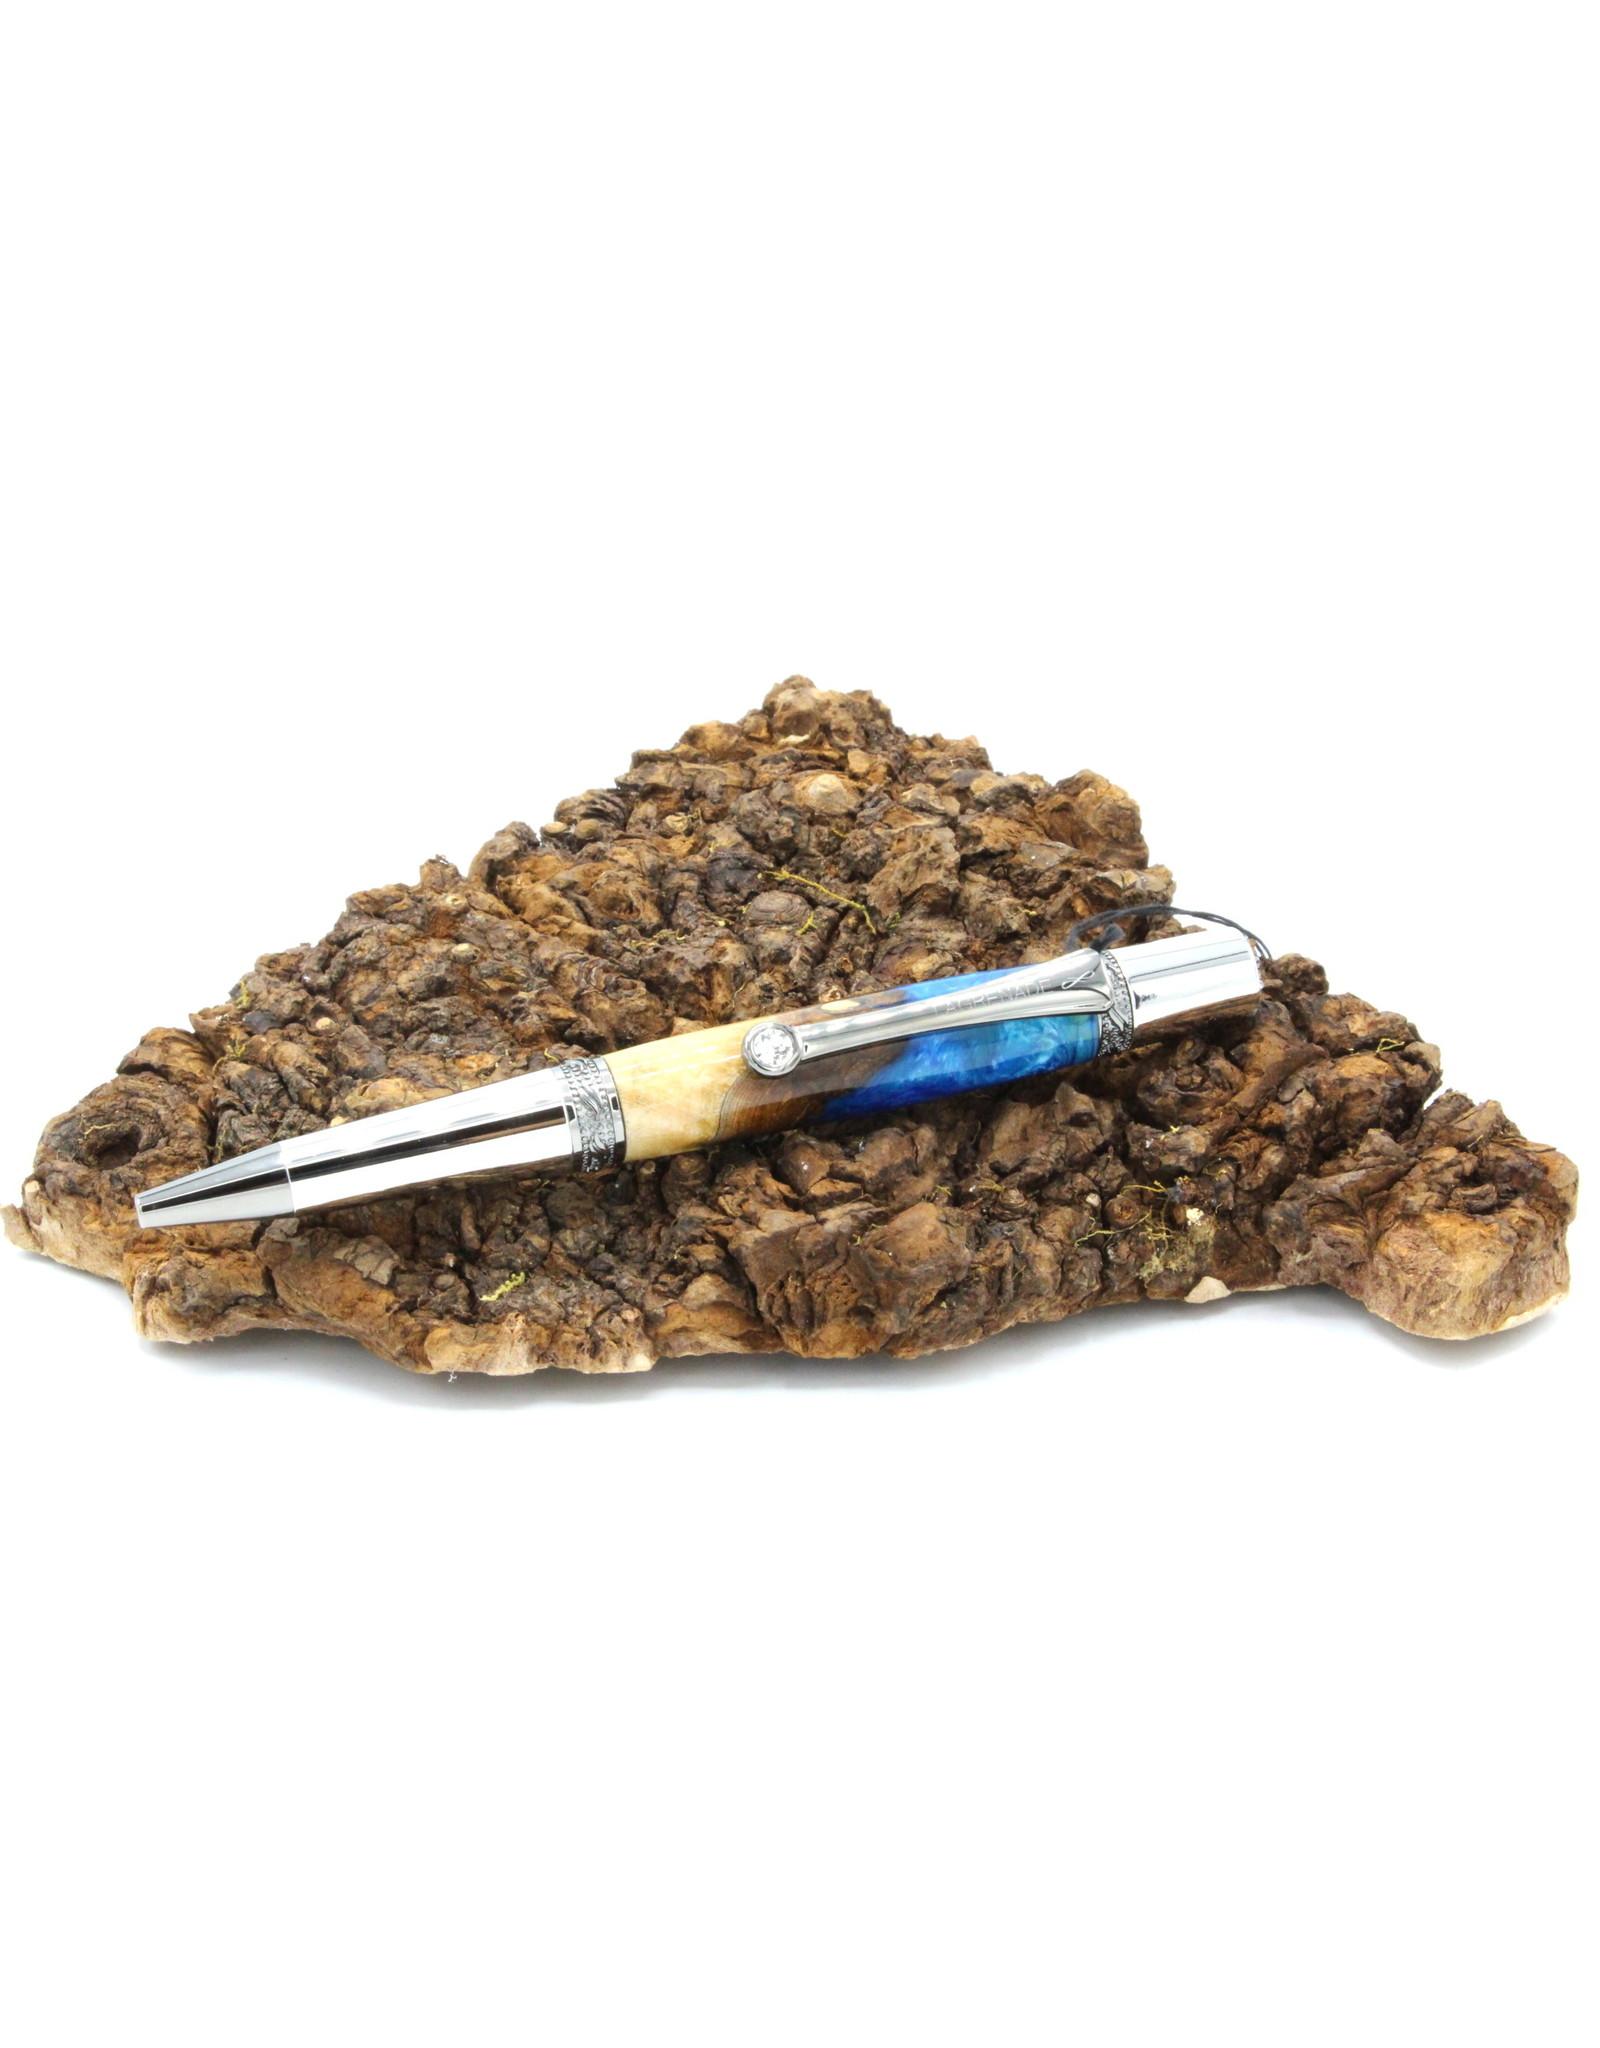 Maple Pen - Izar